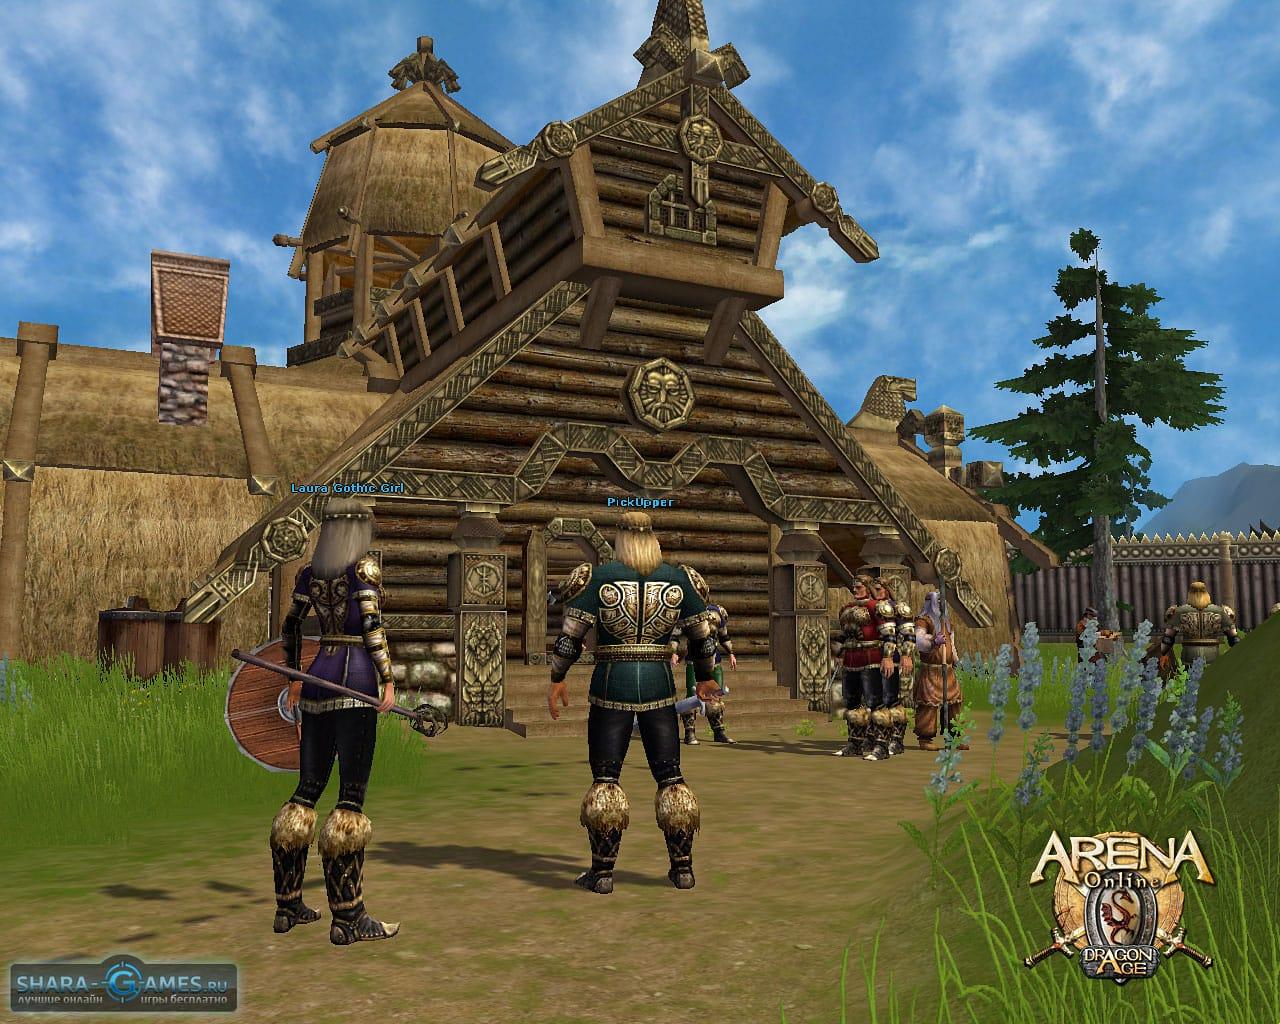 http://shara-games.ru/uploads/posts/2013-02/1360910921_tvorenya.jpg